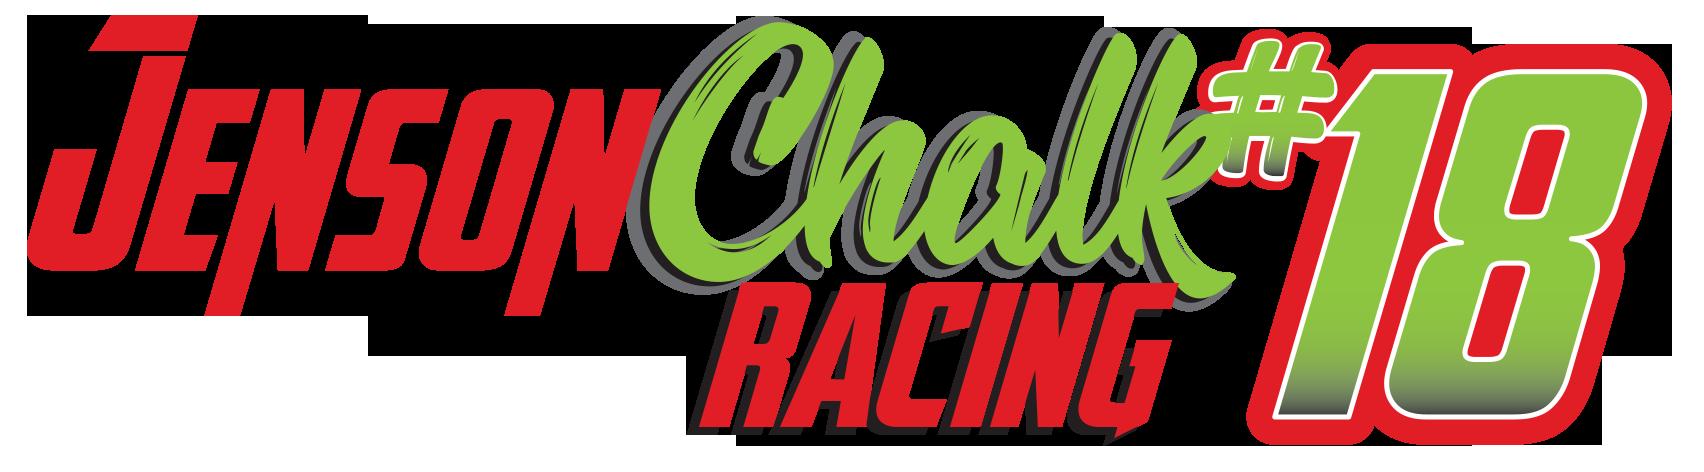 JC18 racing logo